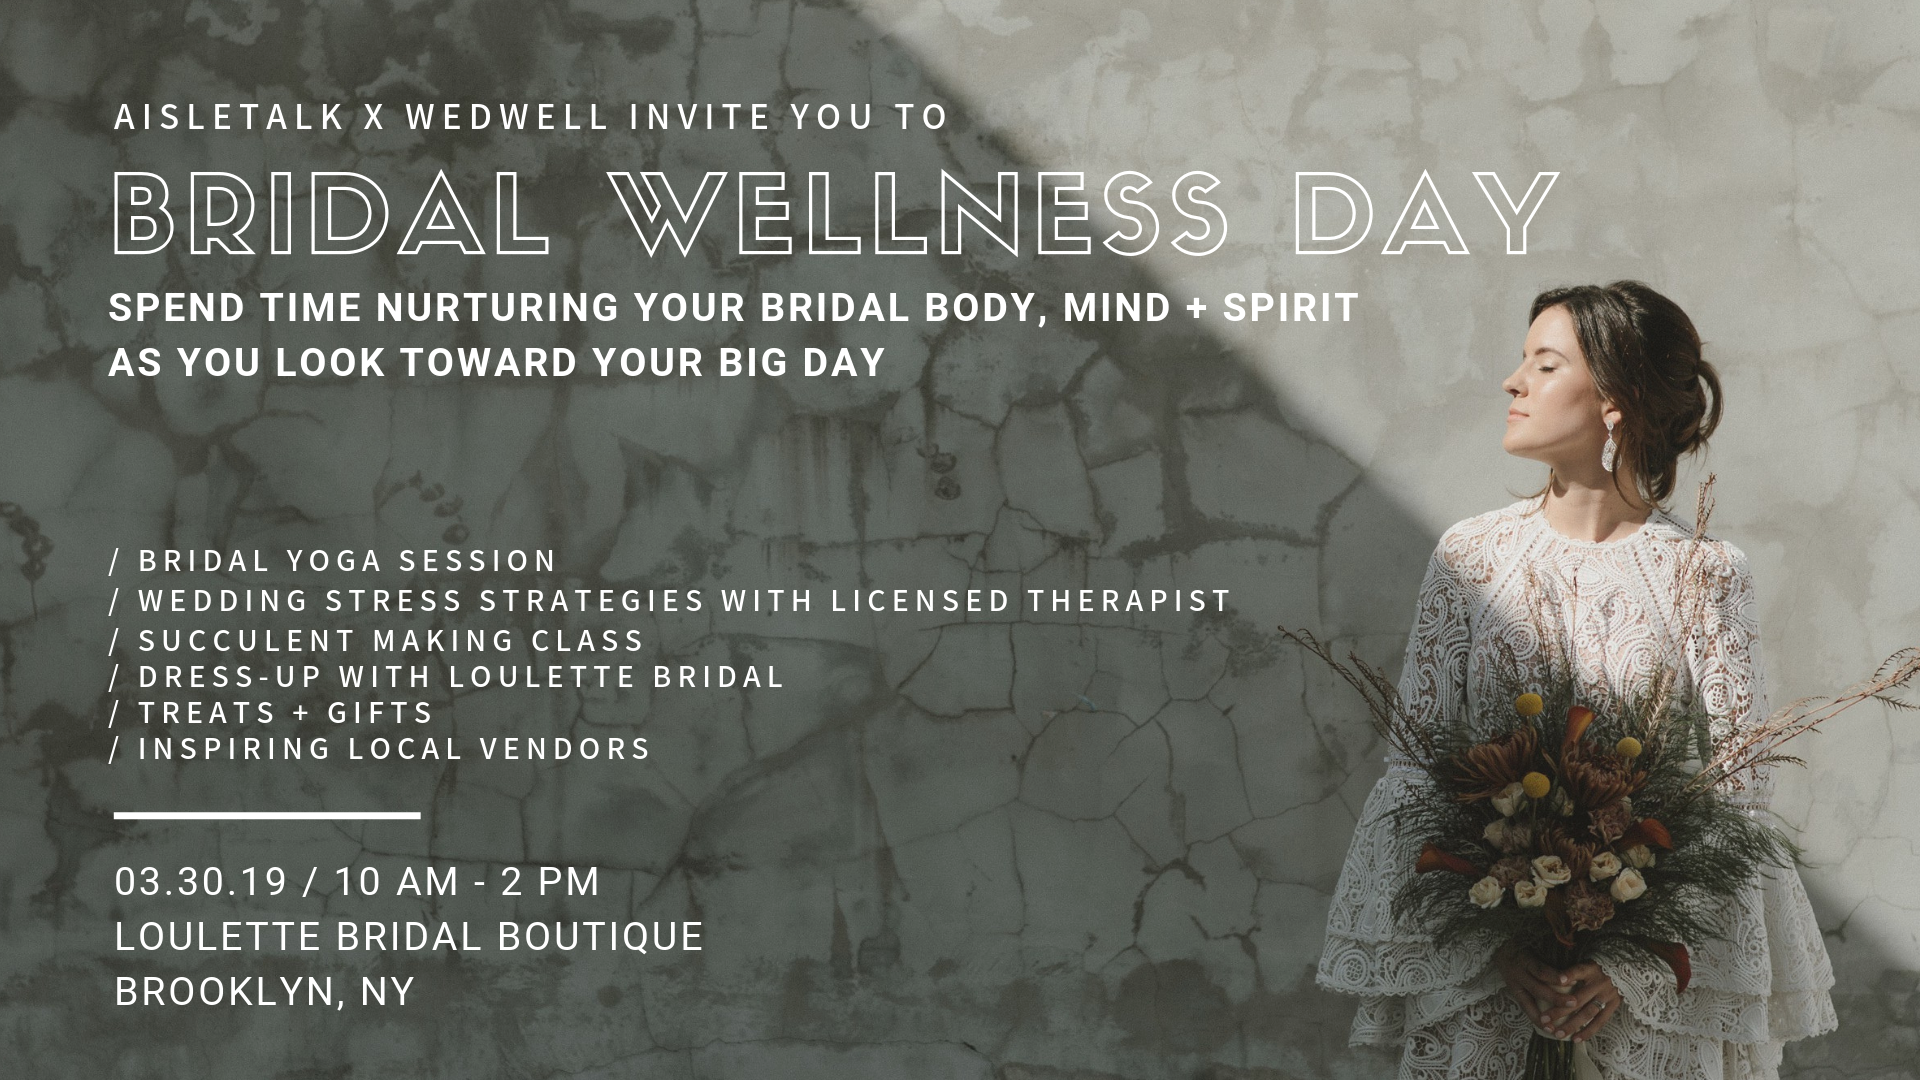 bridal-wellness-day.jpg